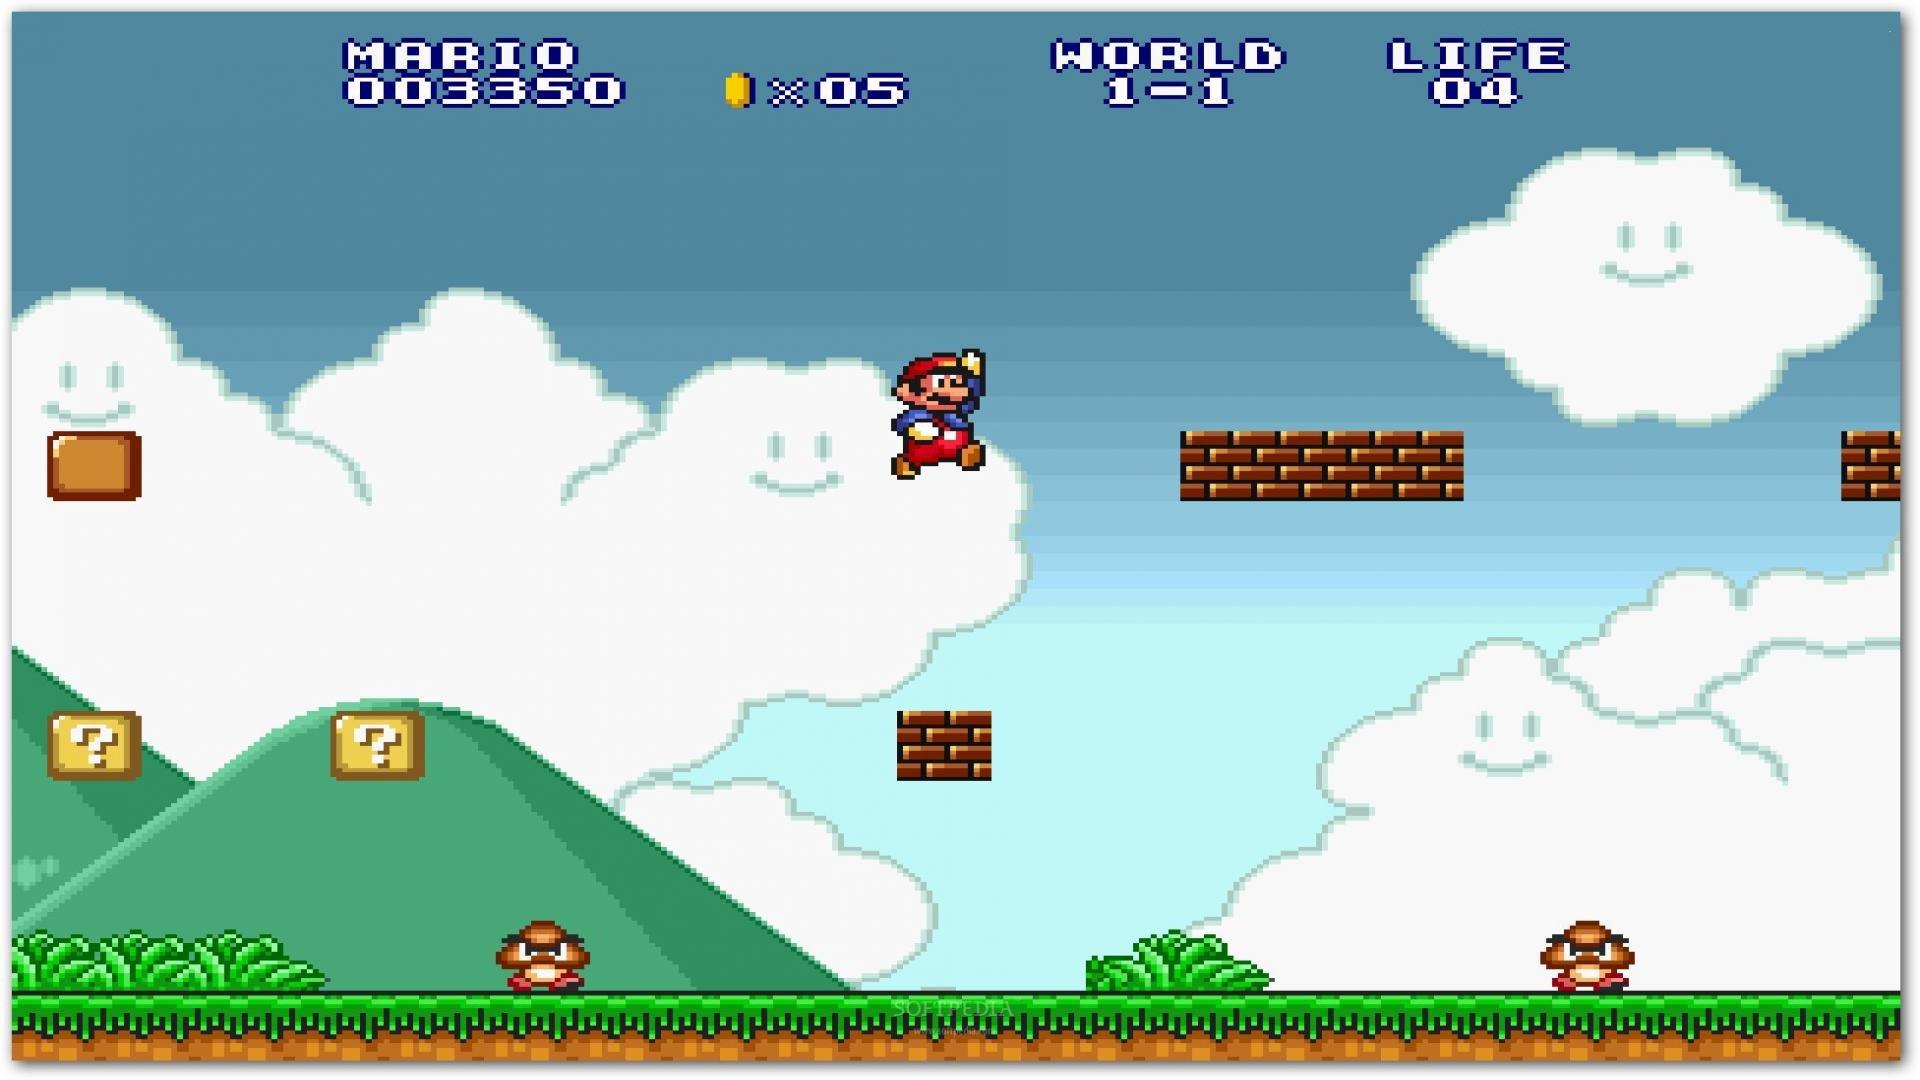 Super Mario Bros 3 Wallpapers Hd For Desktop Backgrounds